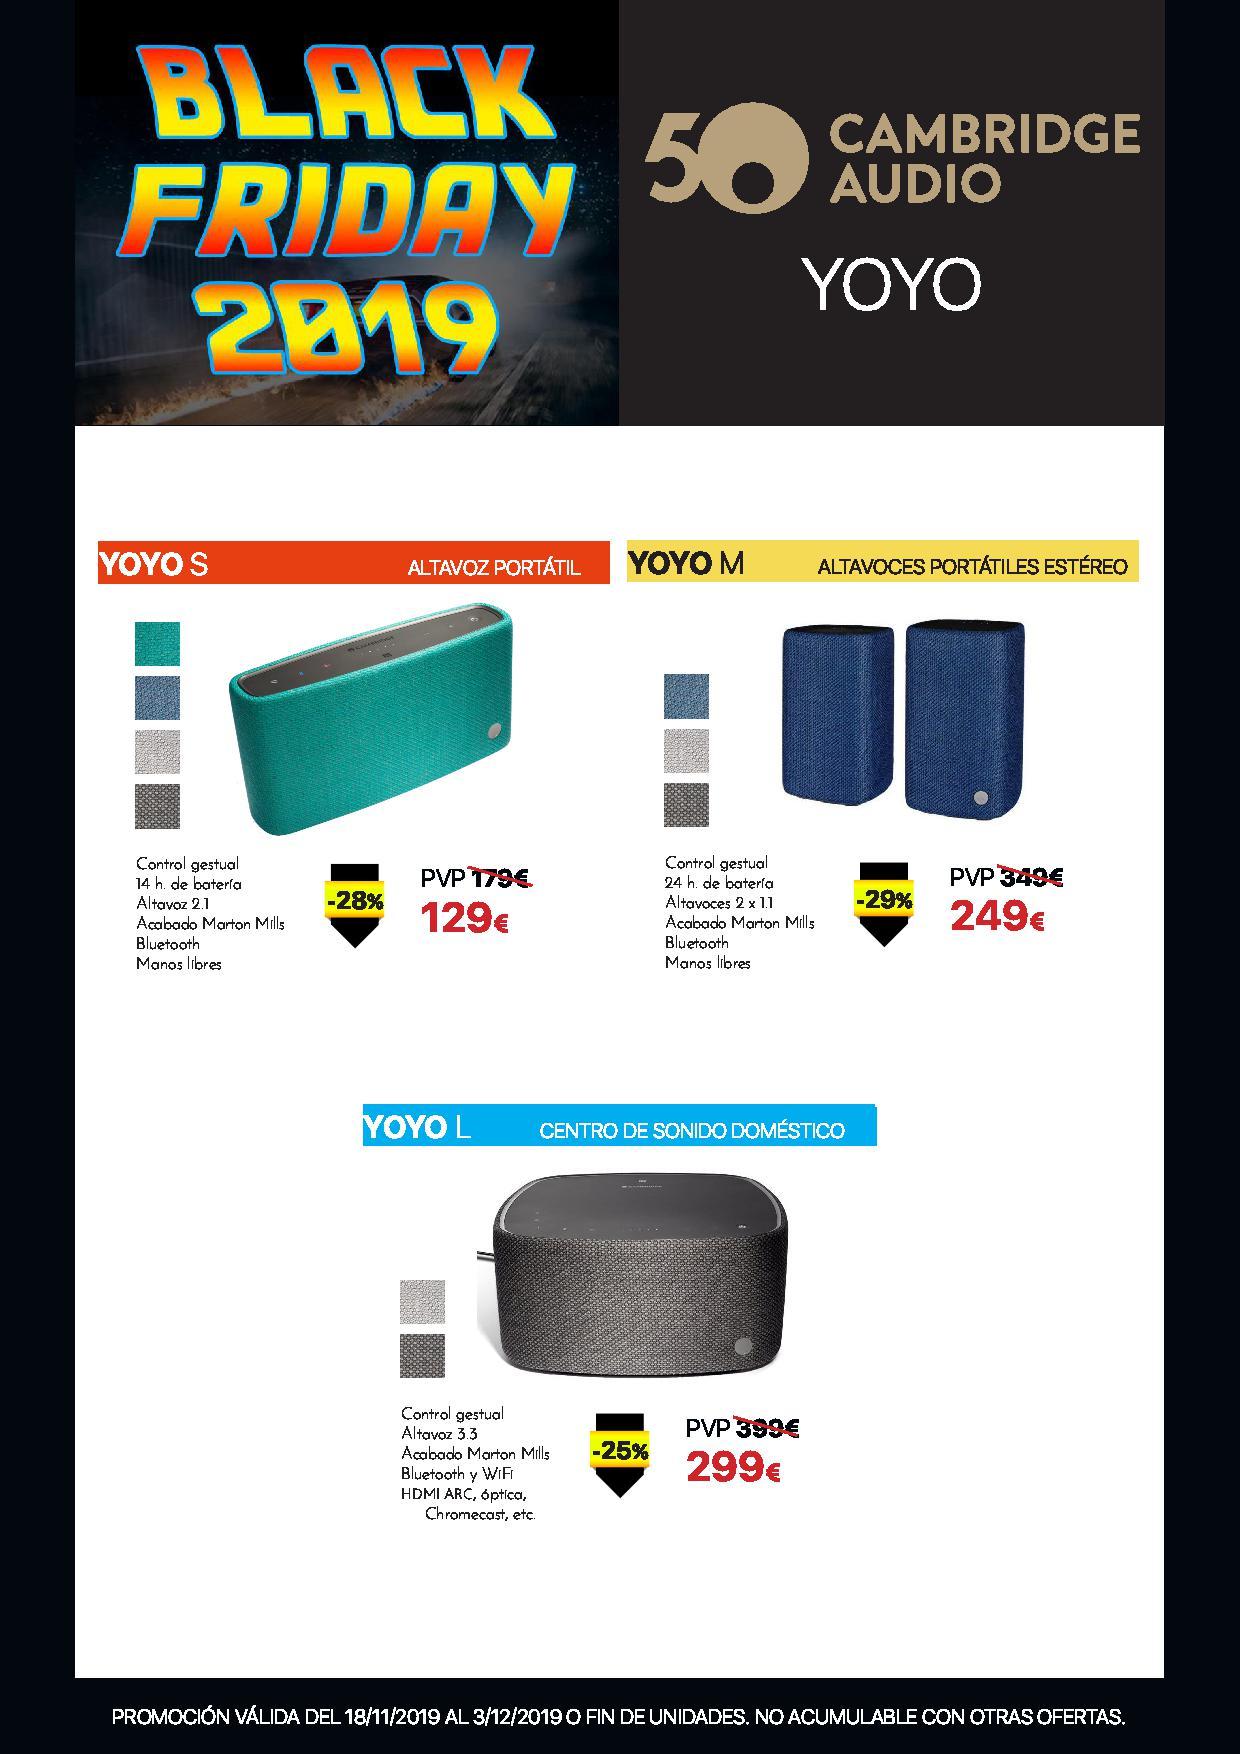 cambirdge yoyo black friday 2019